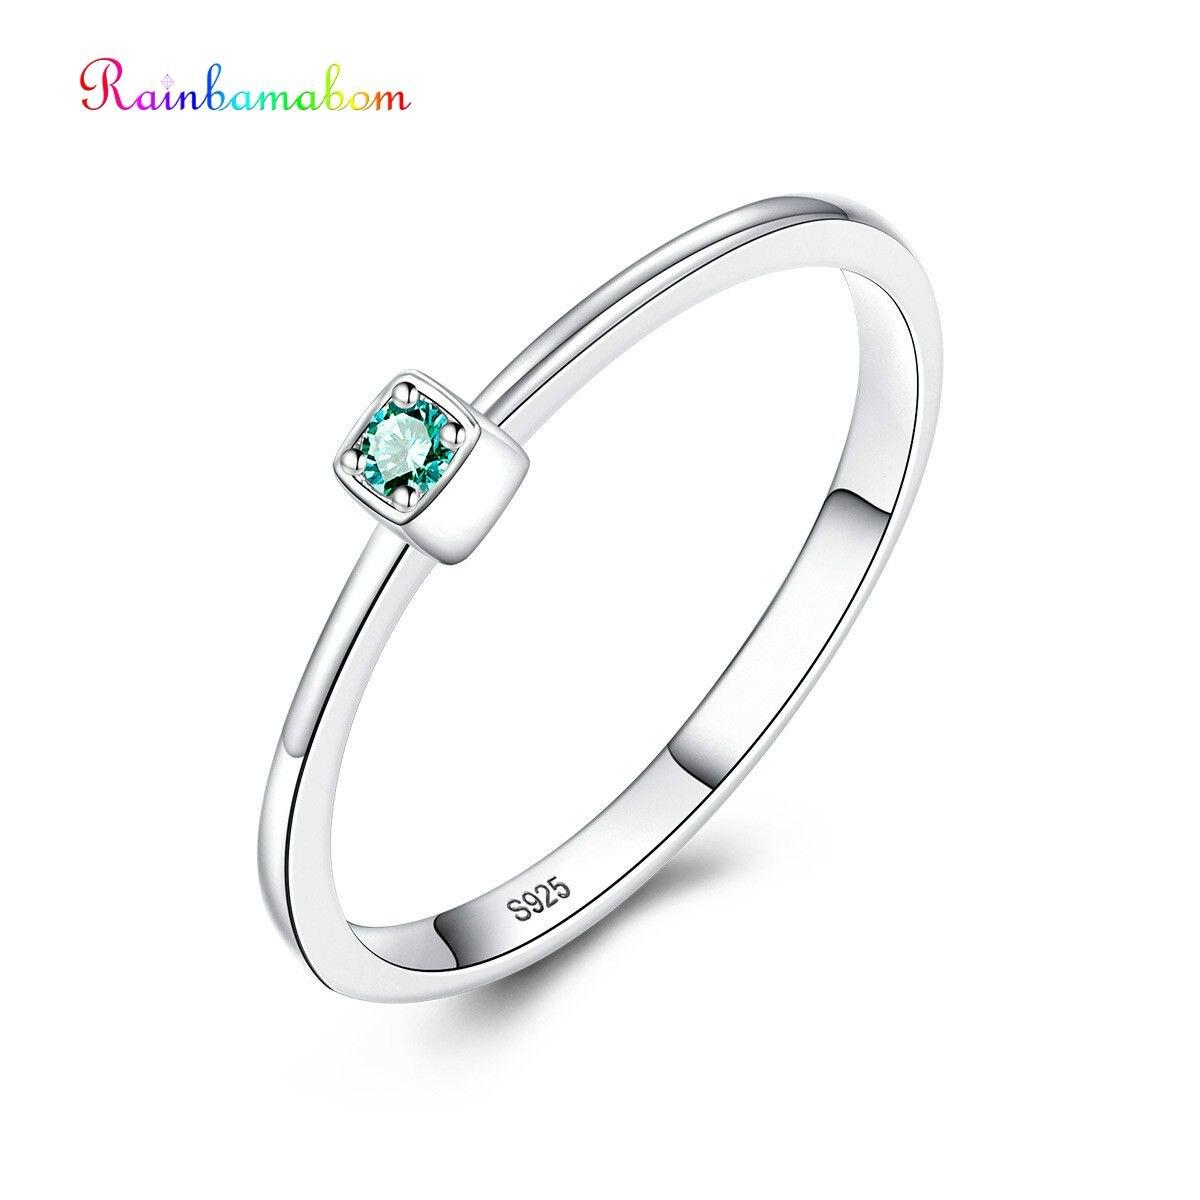 Rainbamabom Classic 925 Solid Sterling Silver Emerald Gemstone Wedding Engagement Ring Women Jewelry Wholesale Drop Shipping